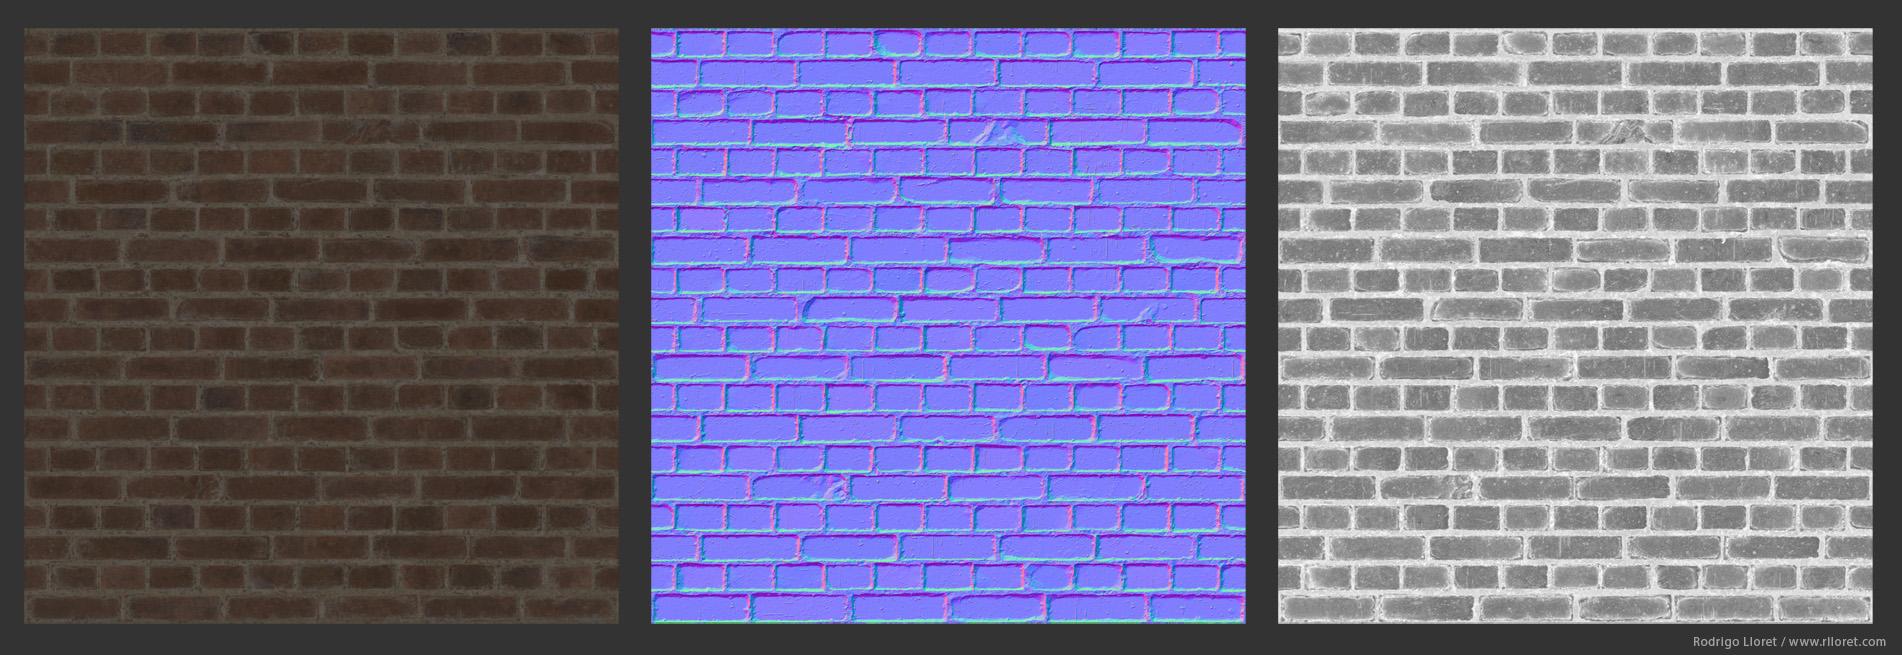 Tile_Bricks1_B1.jpg